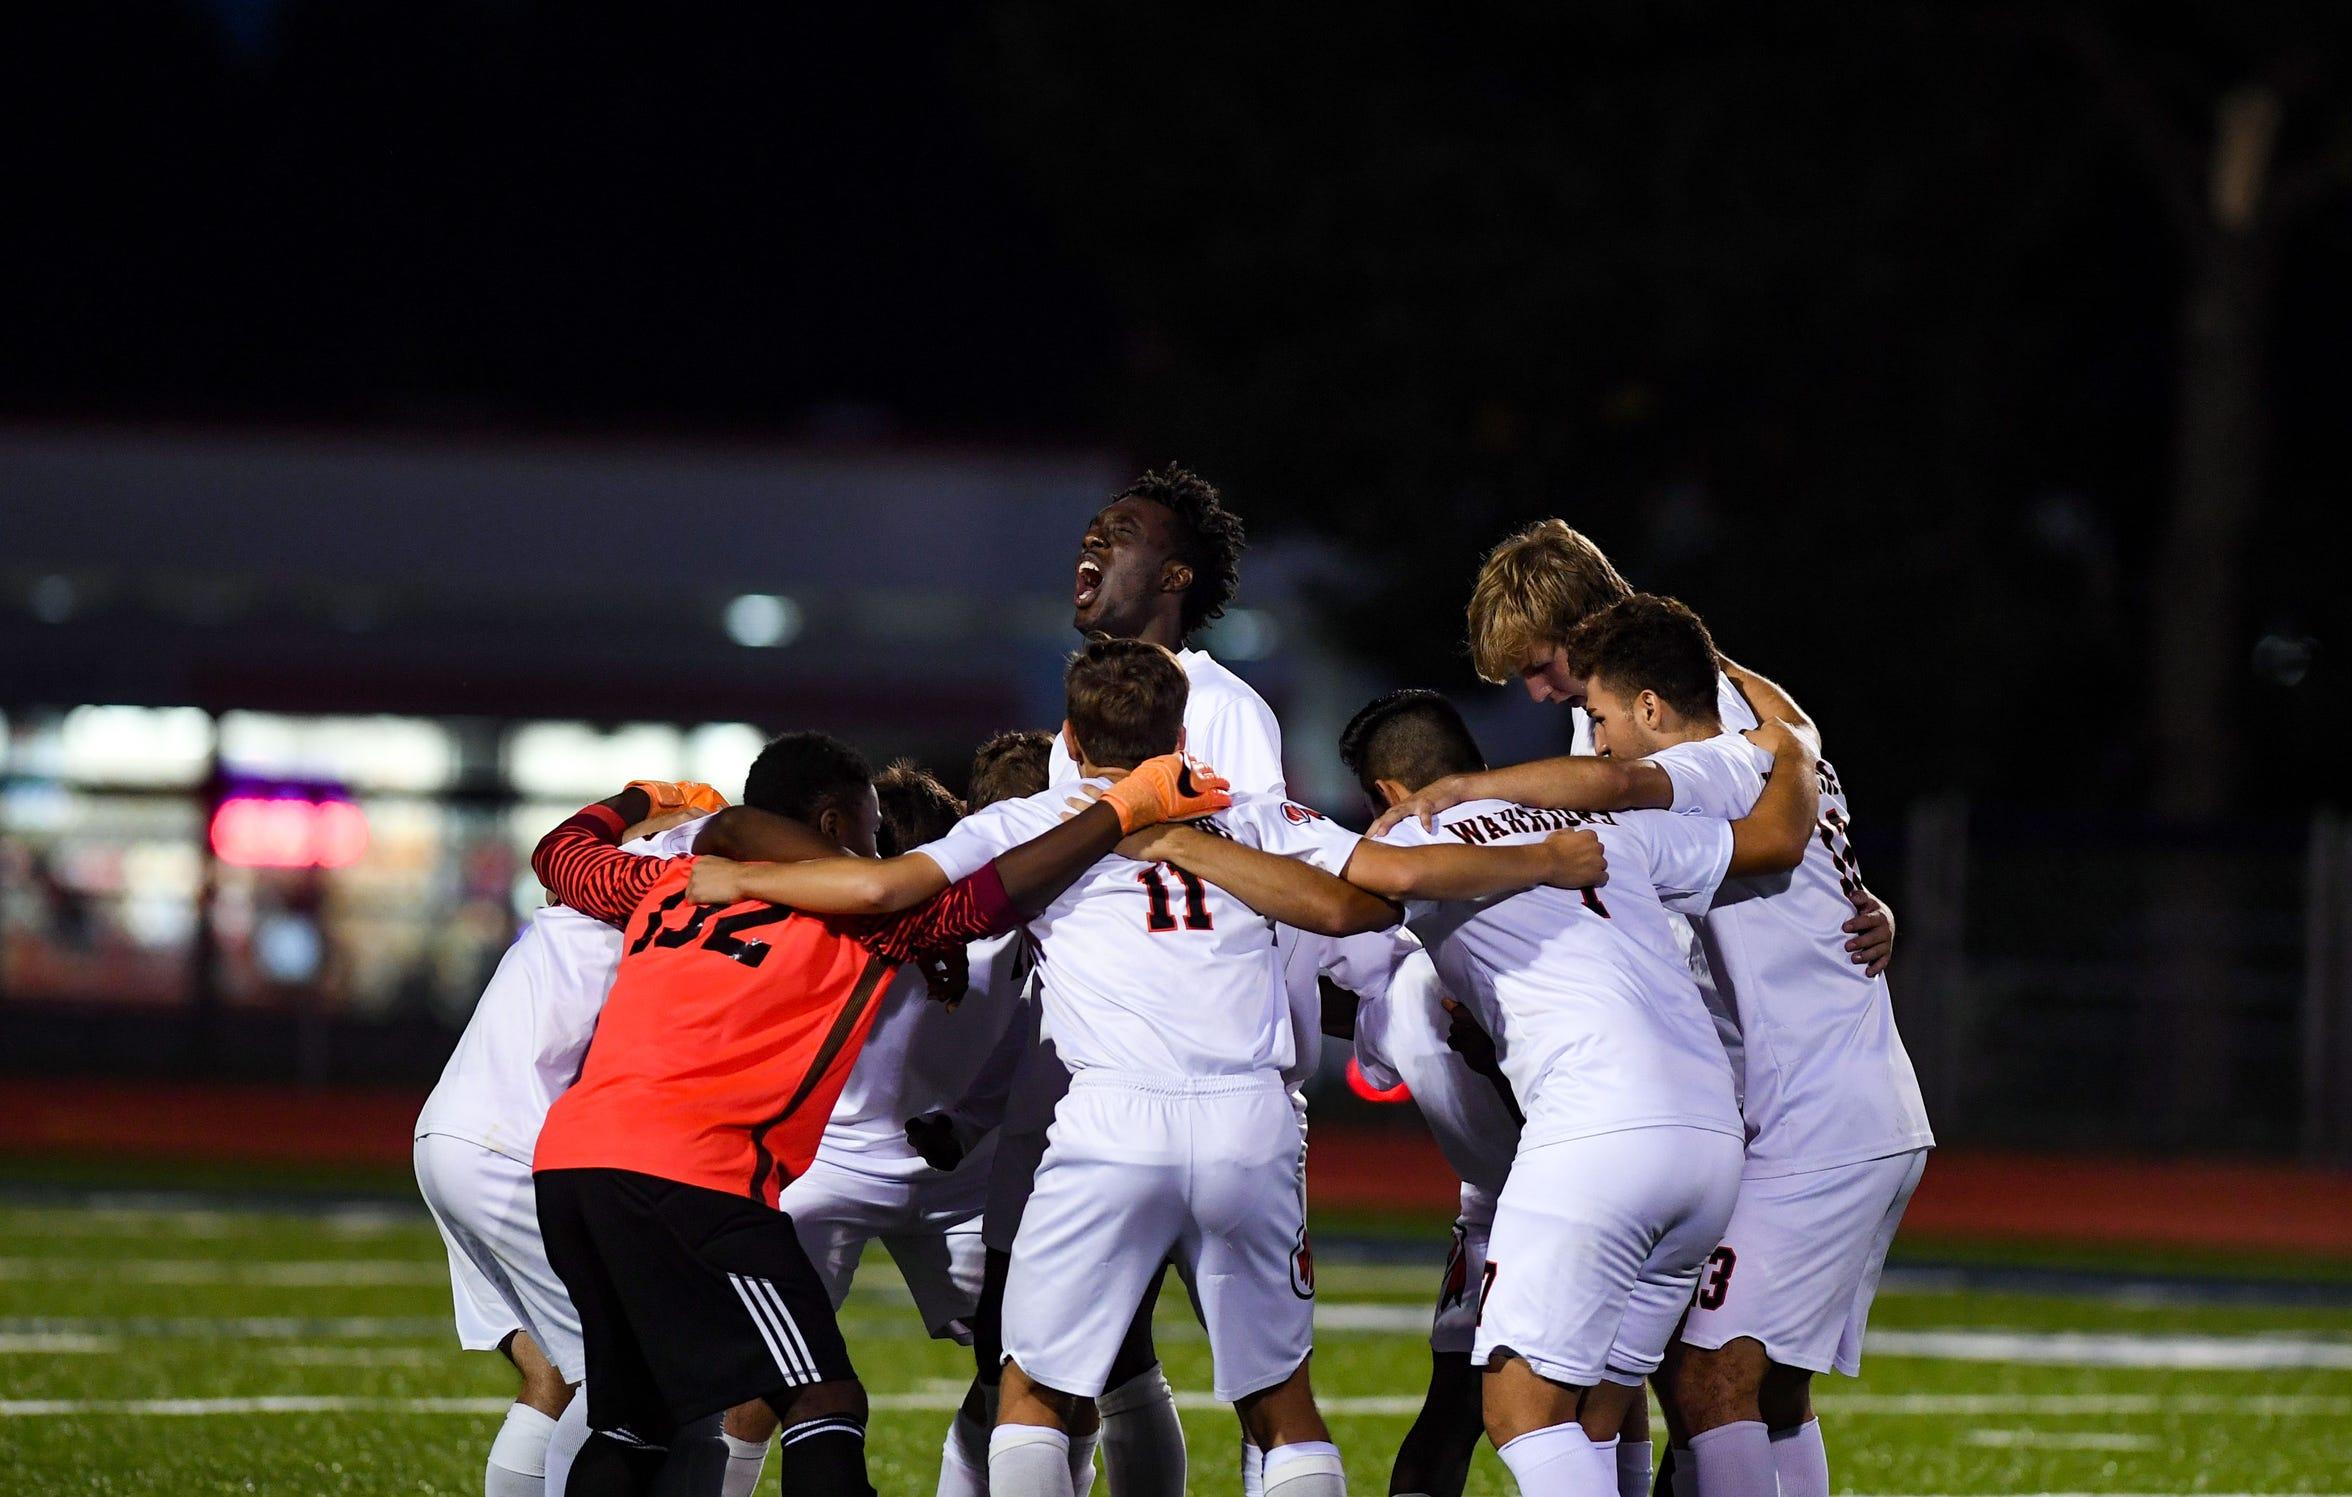 The Washington High School varsity boys soccer team amps up for a match Tuesday, September 17, 2019 at O'Gorman.